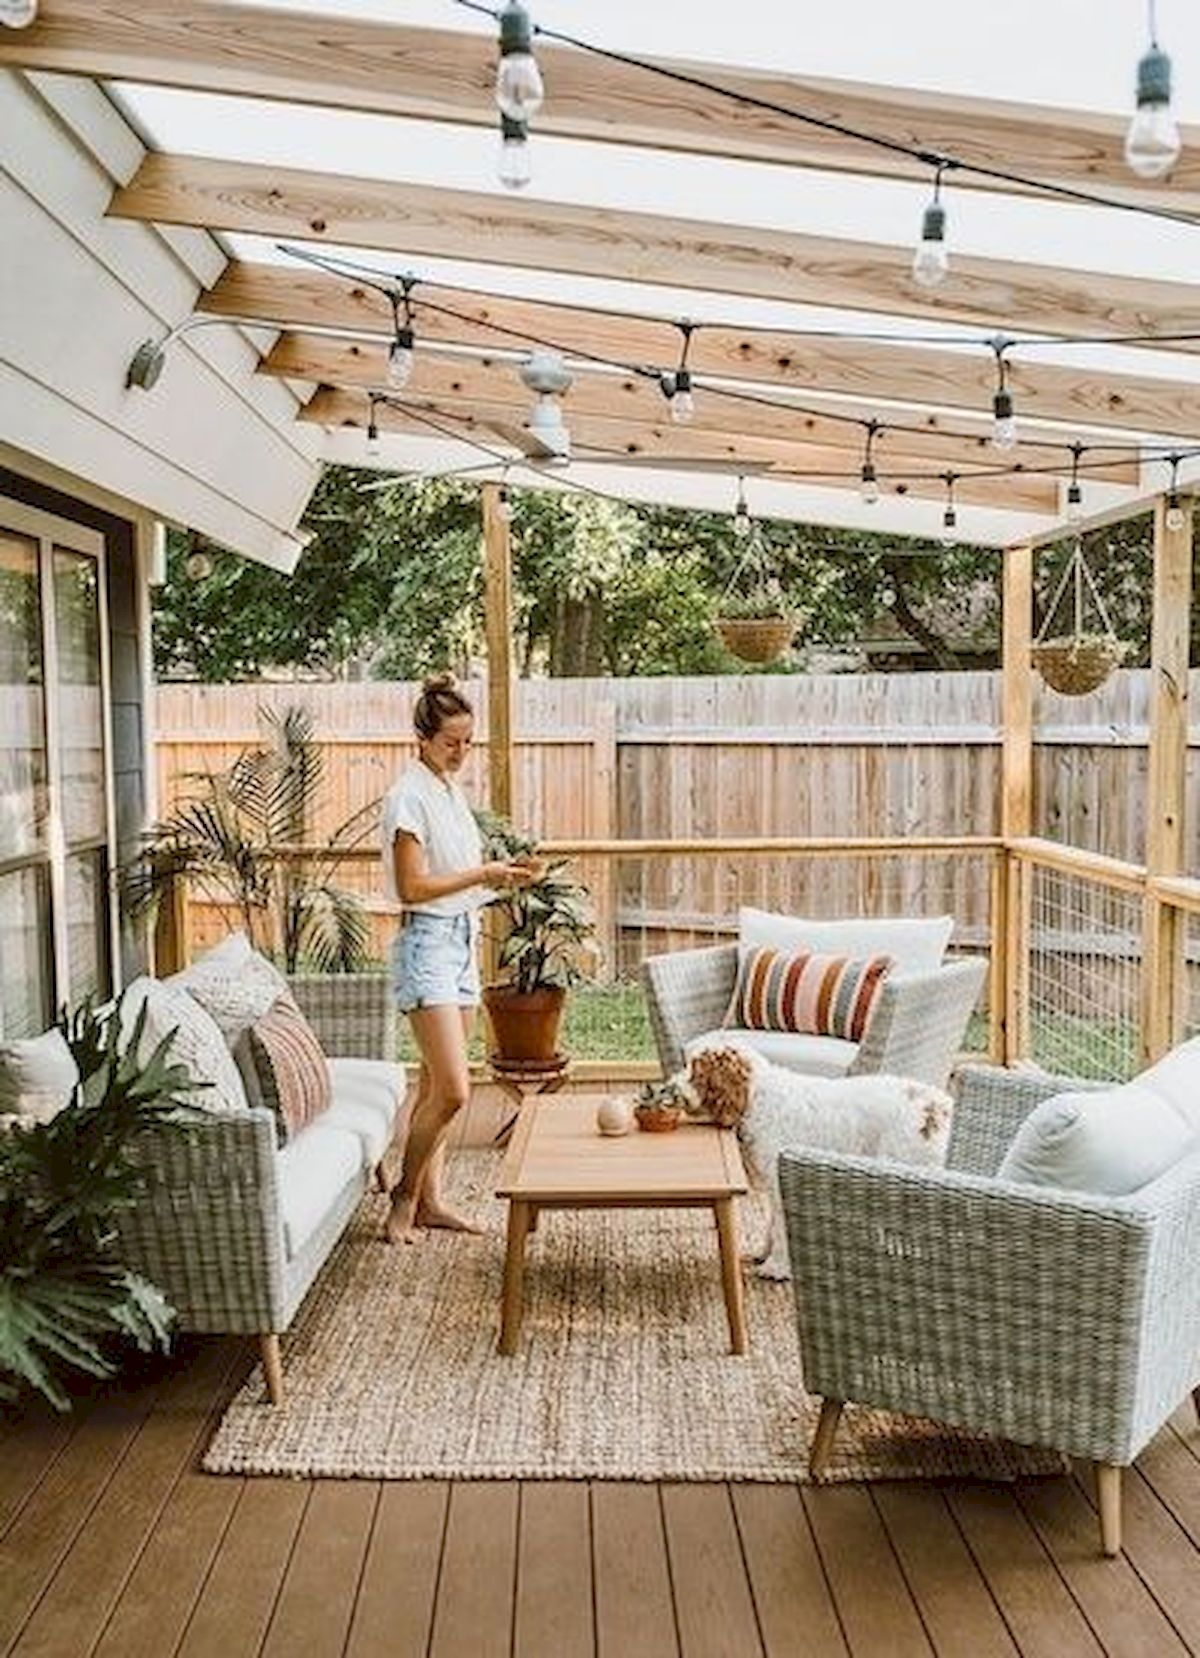 50 Fantastic Backyard Patio and Decking Design Ideas (51)